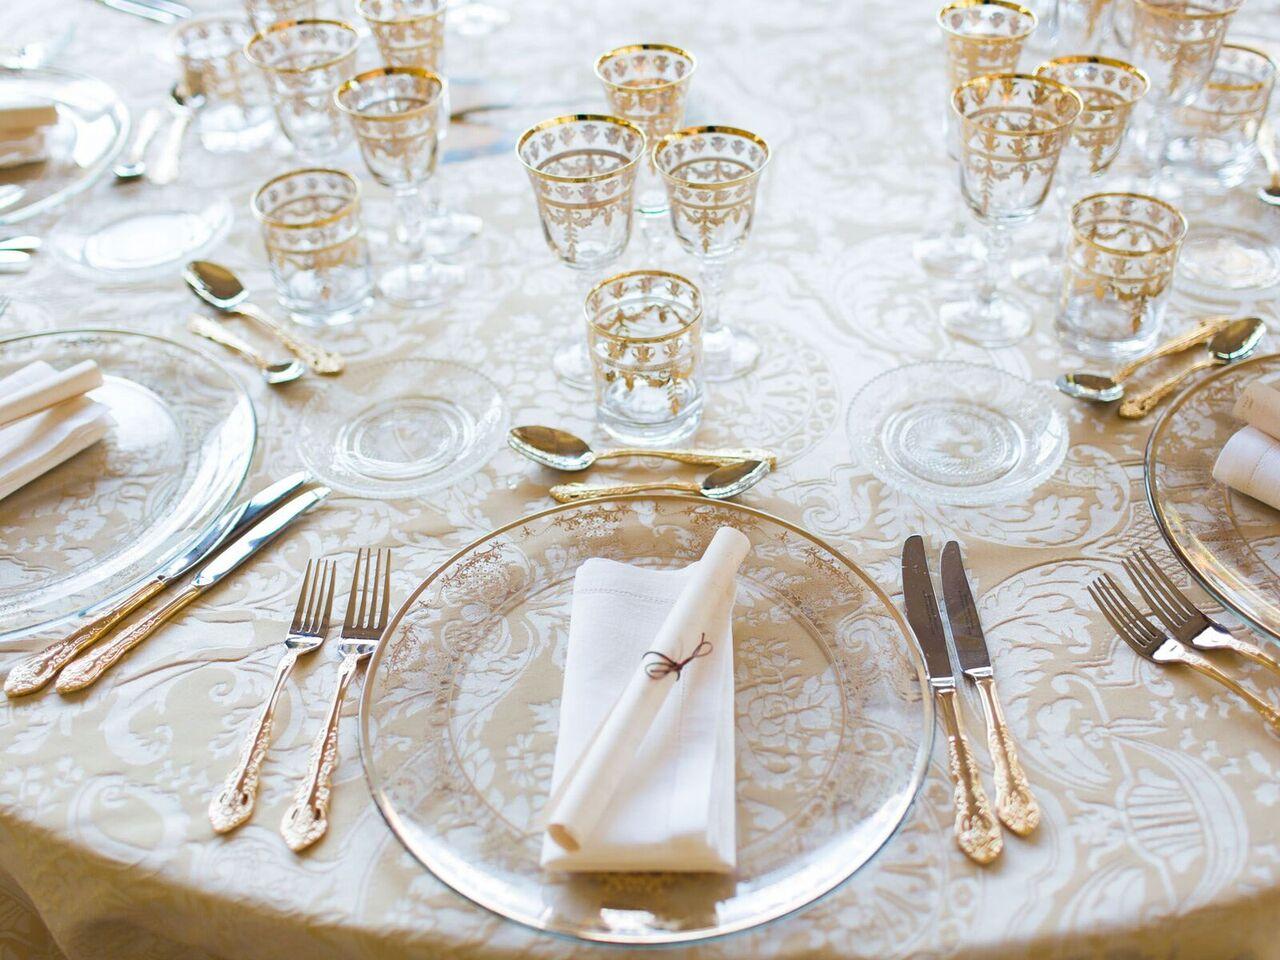 Si-Quiero-Wedding-Planner-By-Sira-Antequera-Paola-Pedro-16